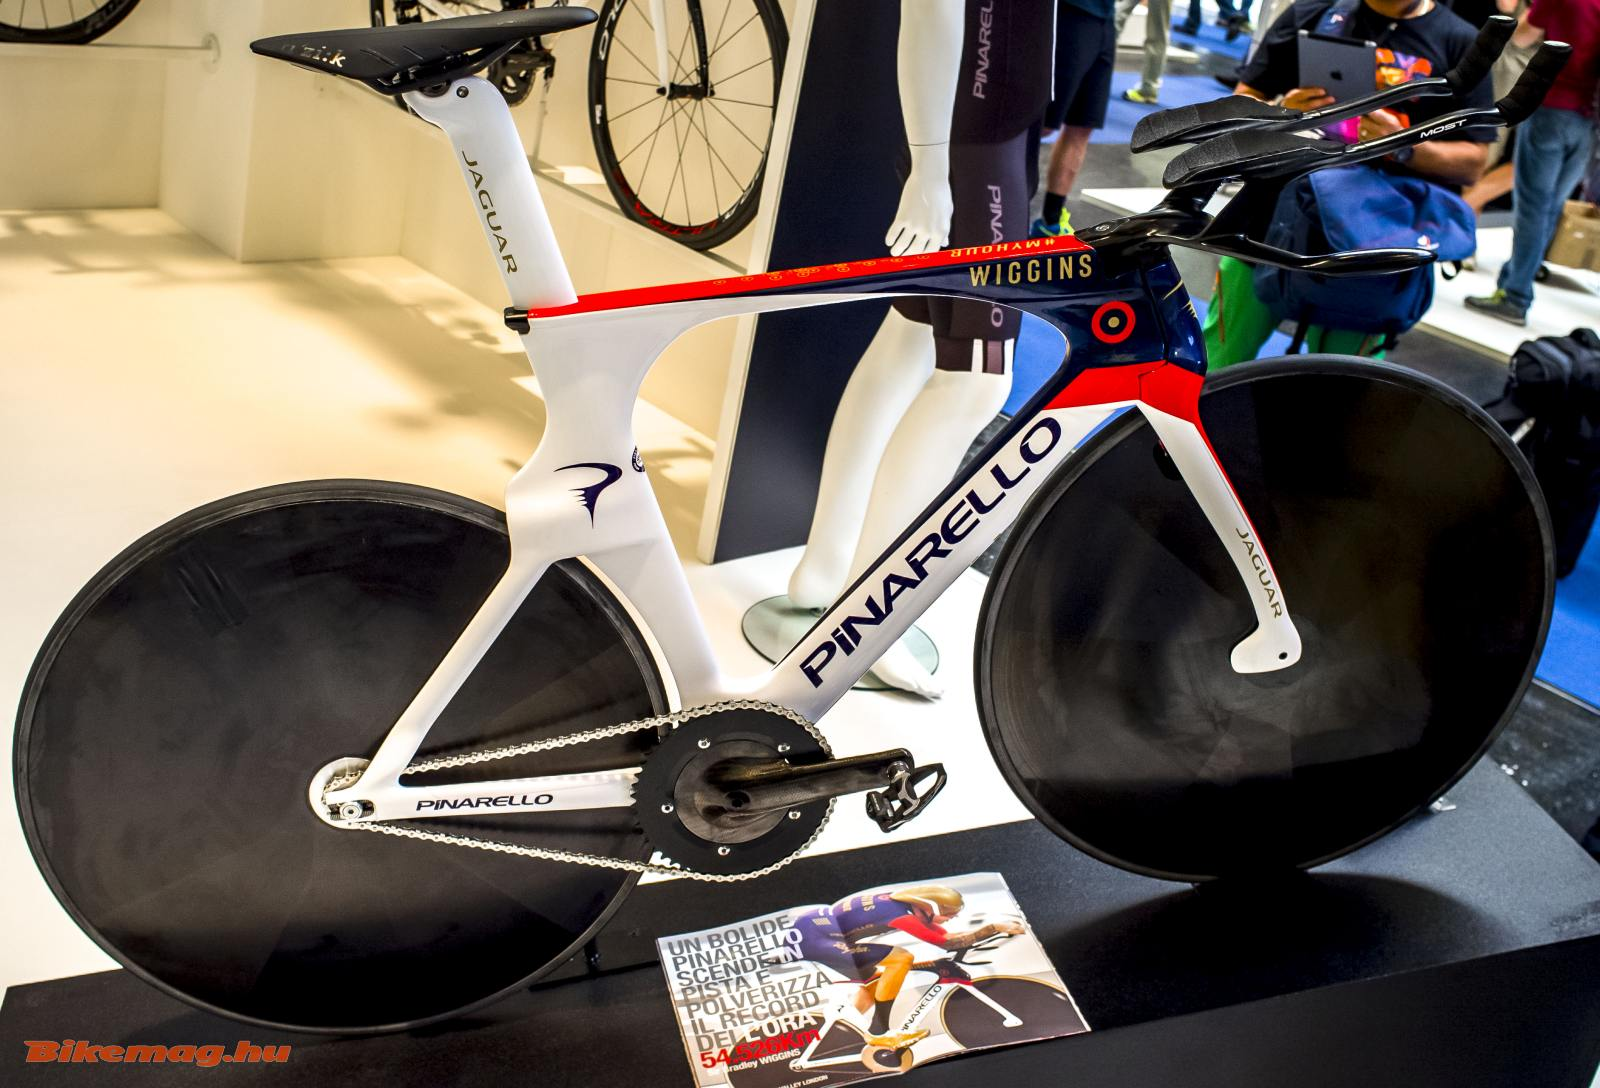 Bradley Wiggins Pinarello Bolide HR kerékpárja